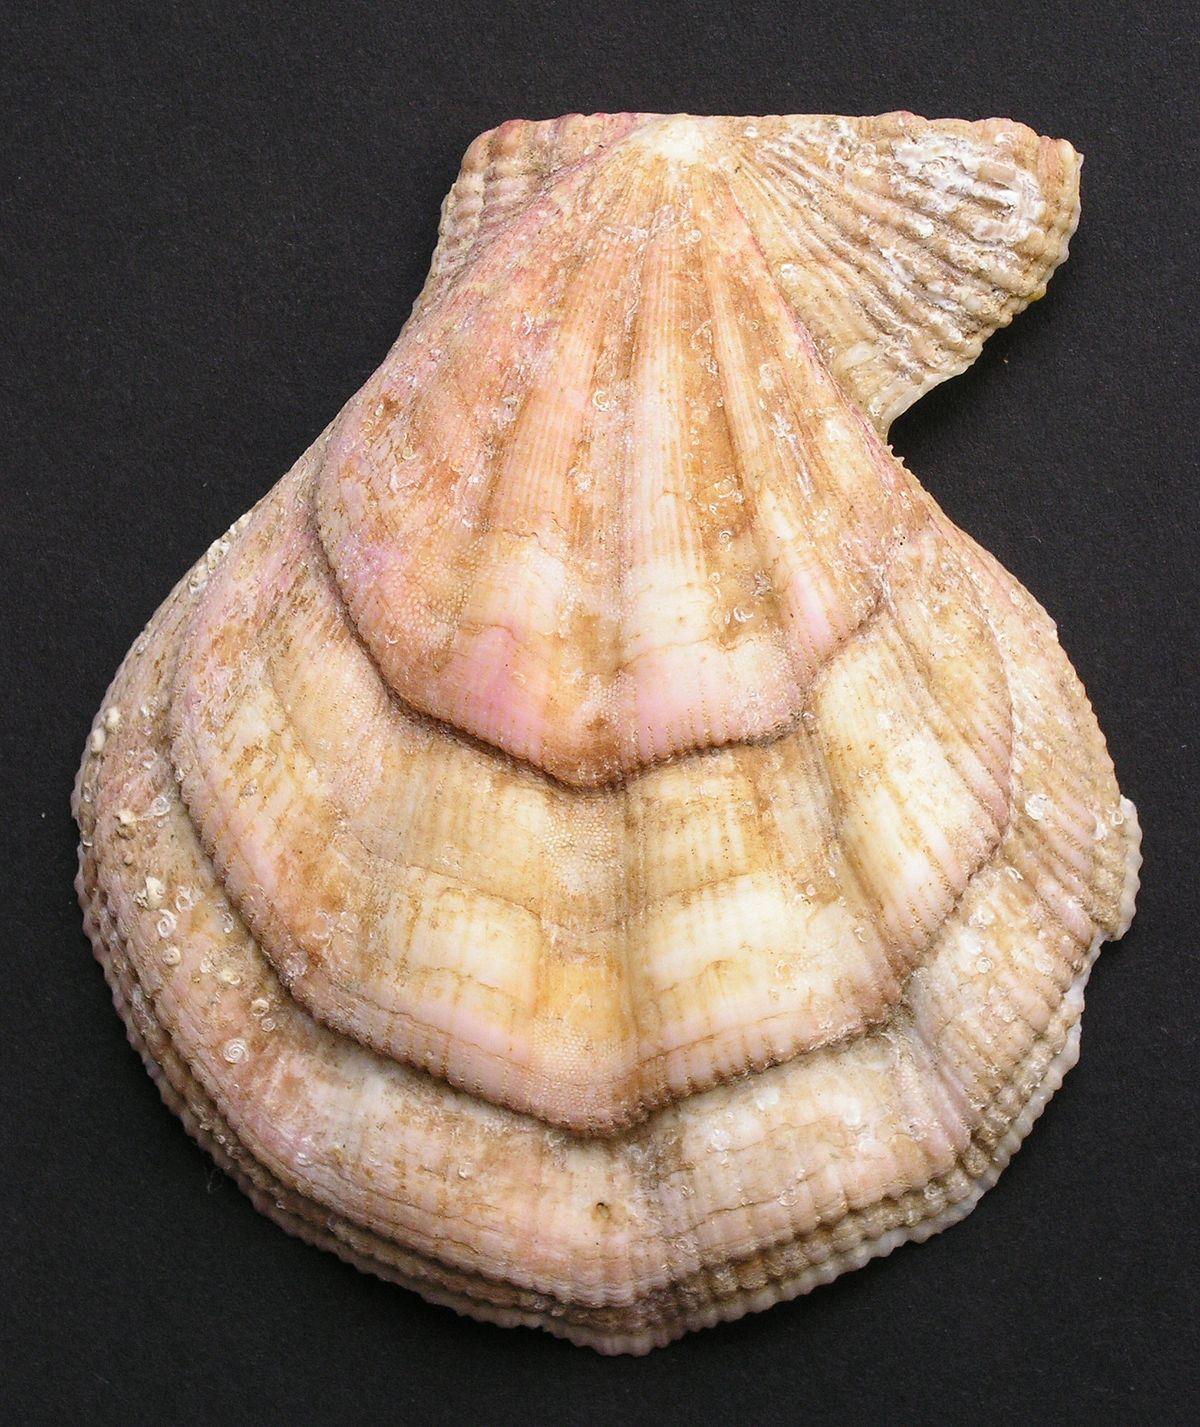 chlamys muschel � wikipedia